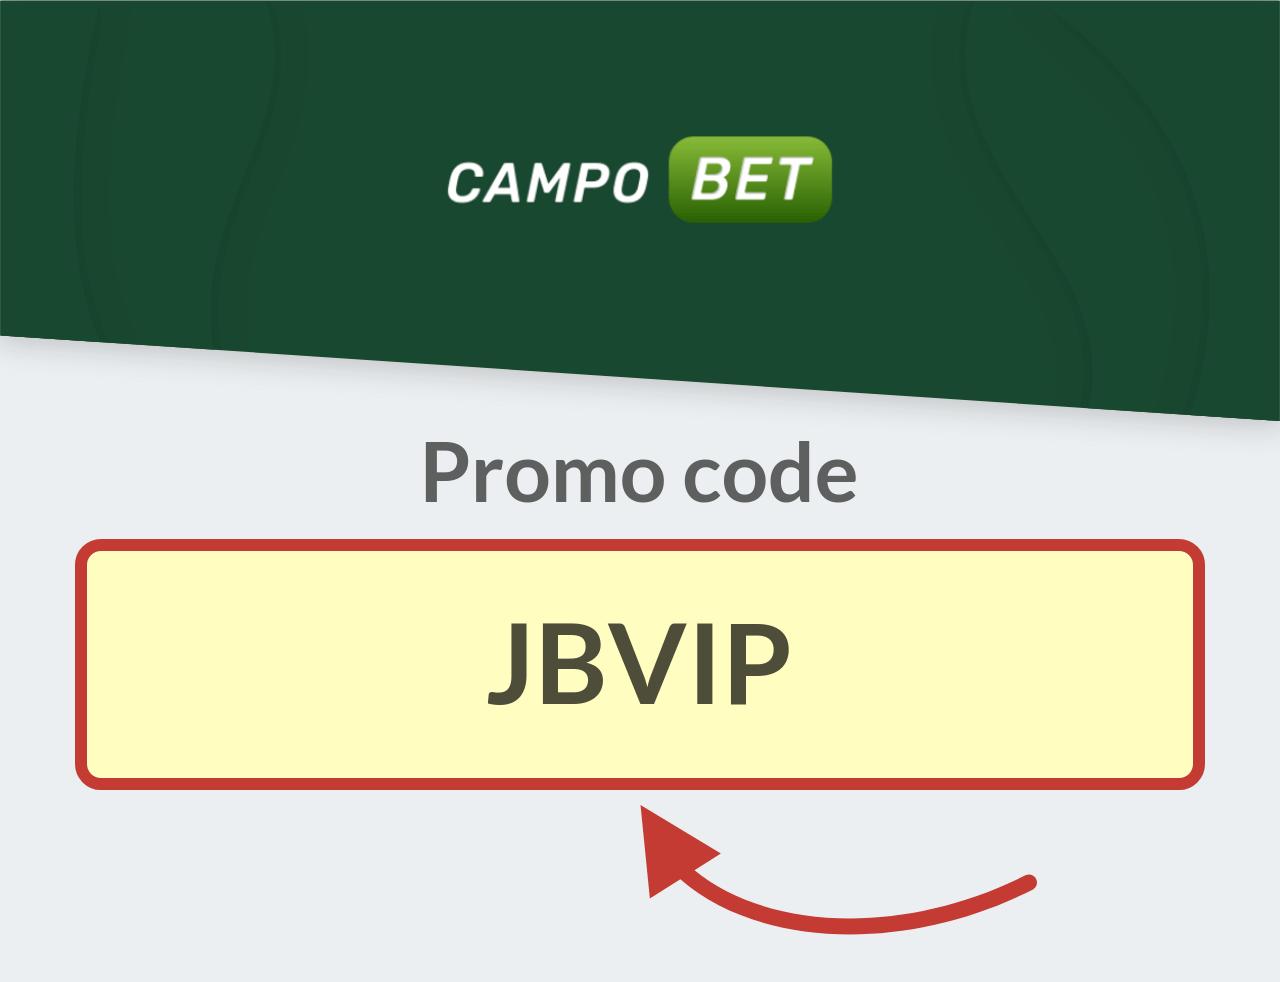 CampoBet Promo Code